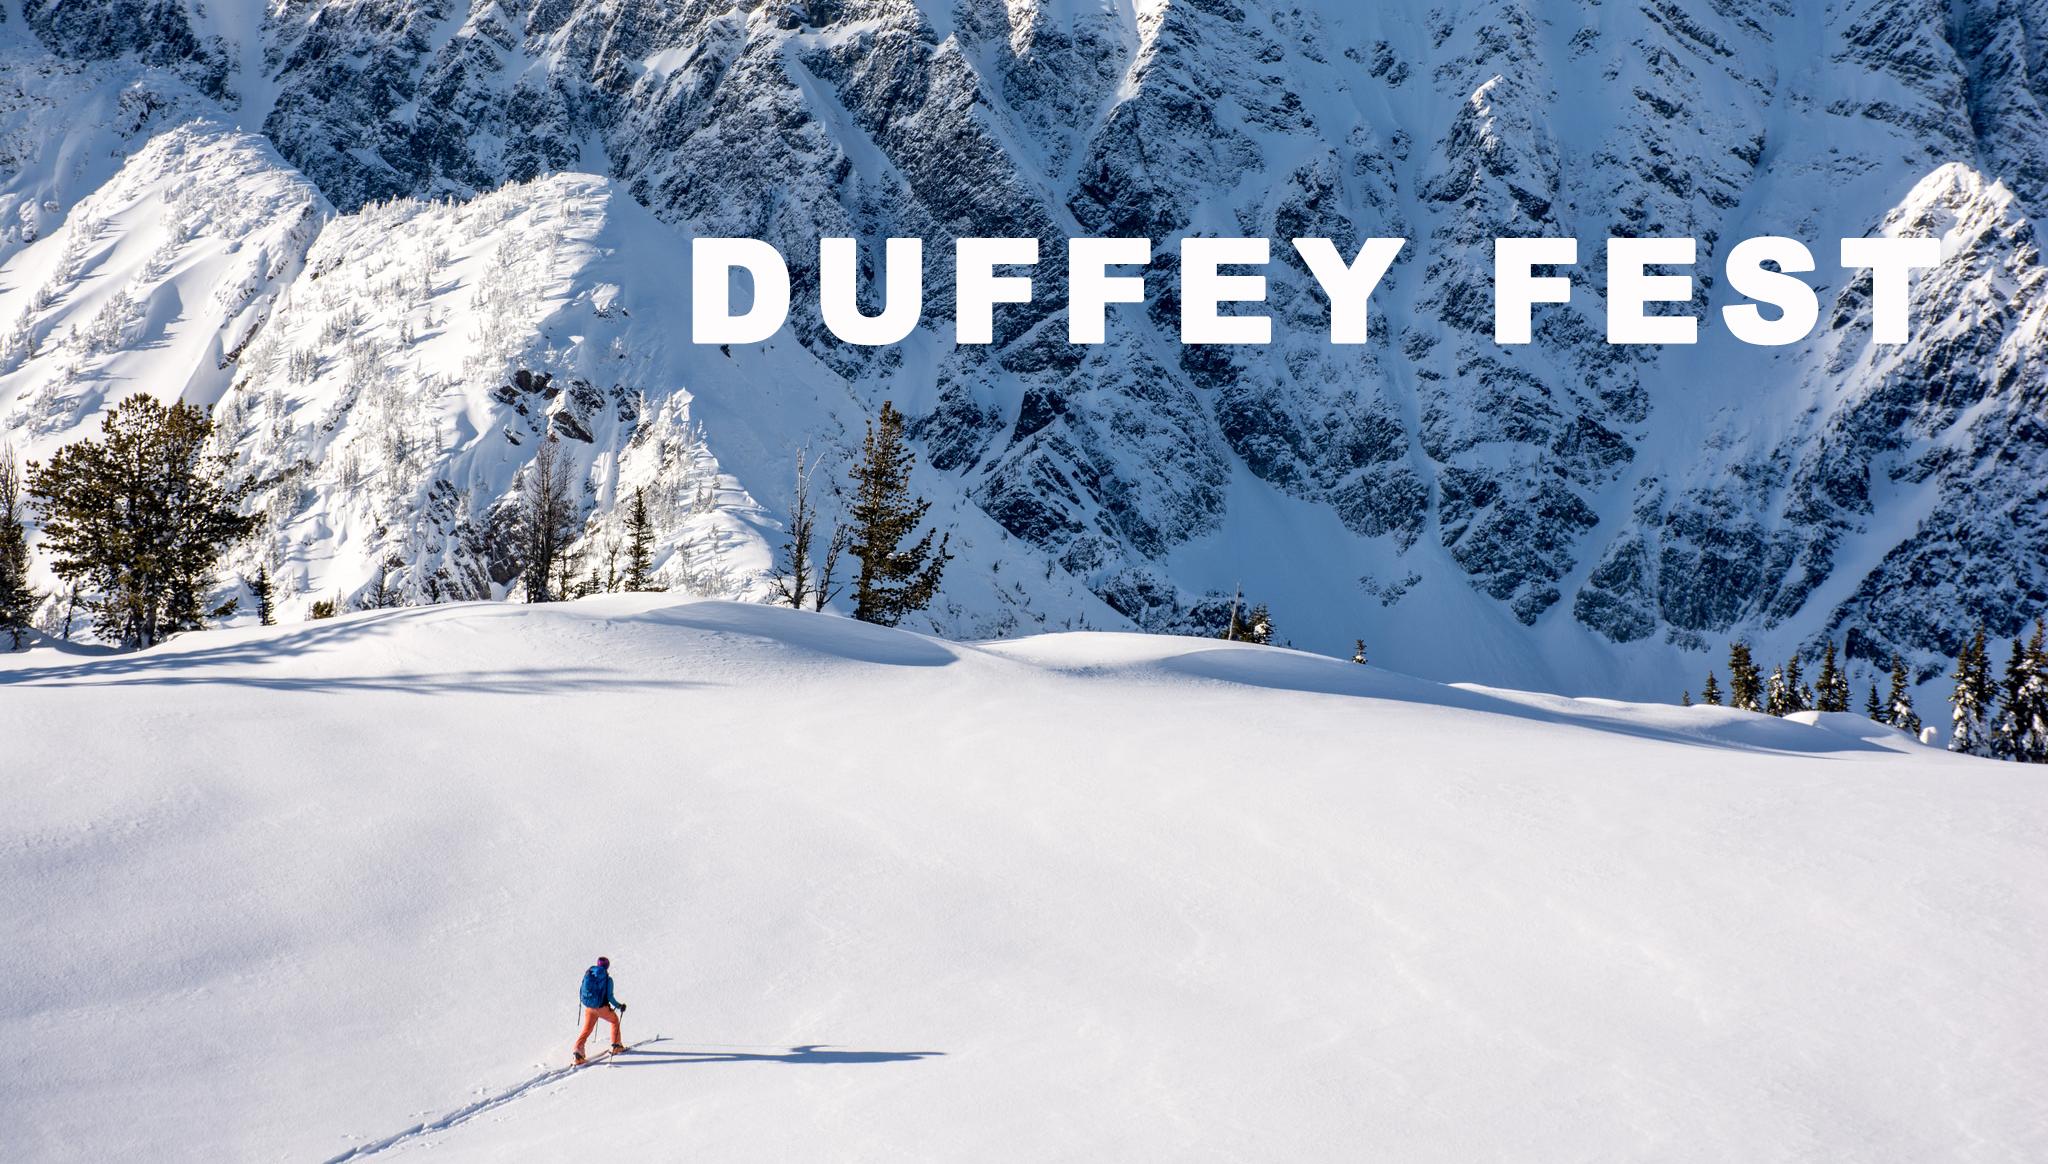 Duffey Fest.jpg